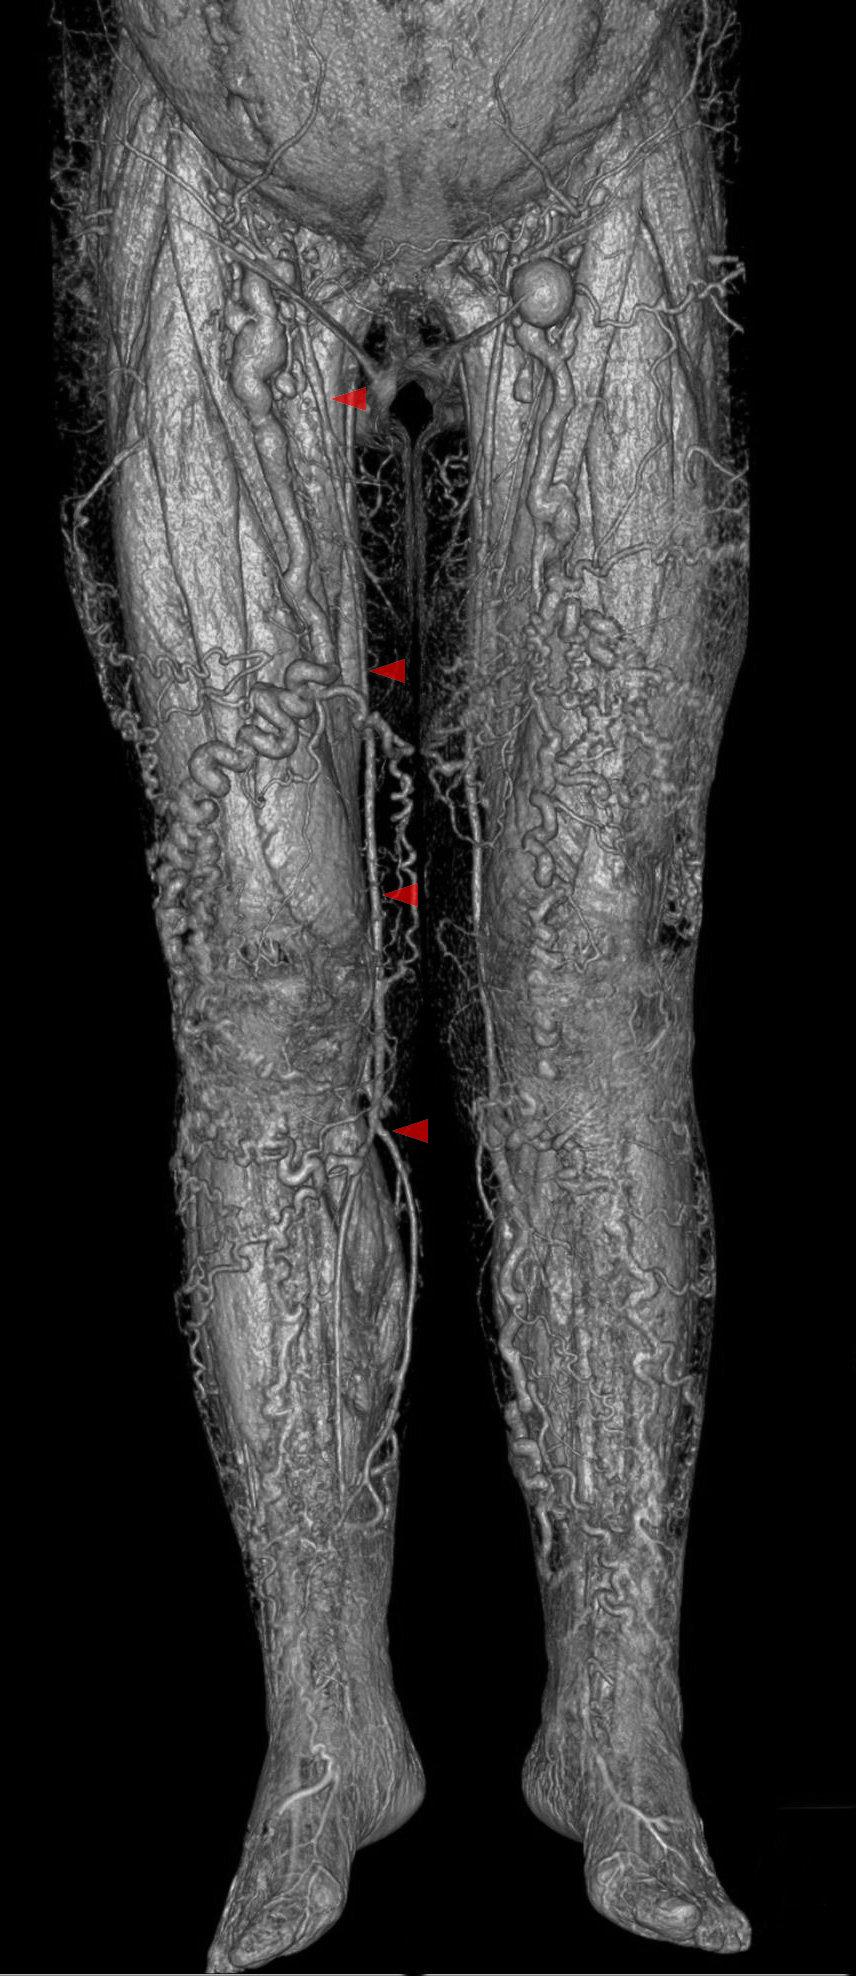 File:Seitenastvarikose - Vena saphena accessoria lateralis - CT ...